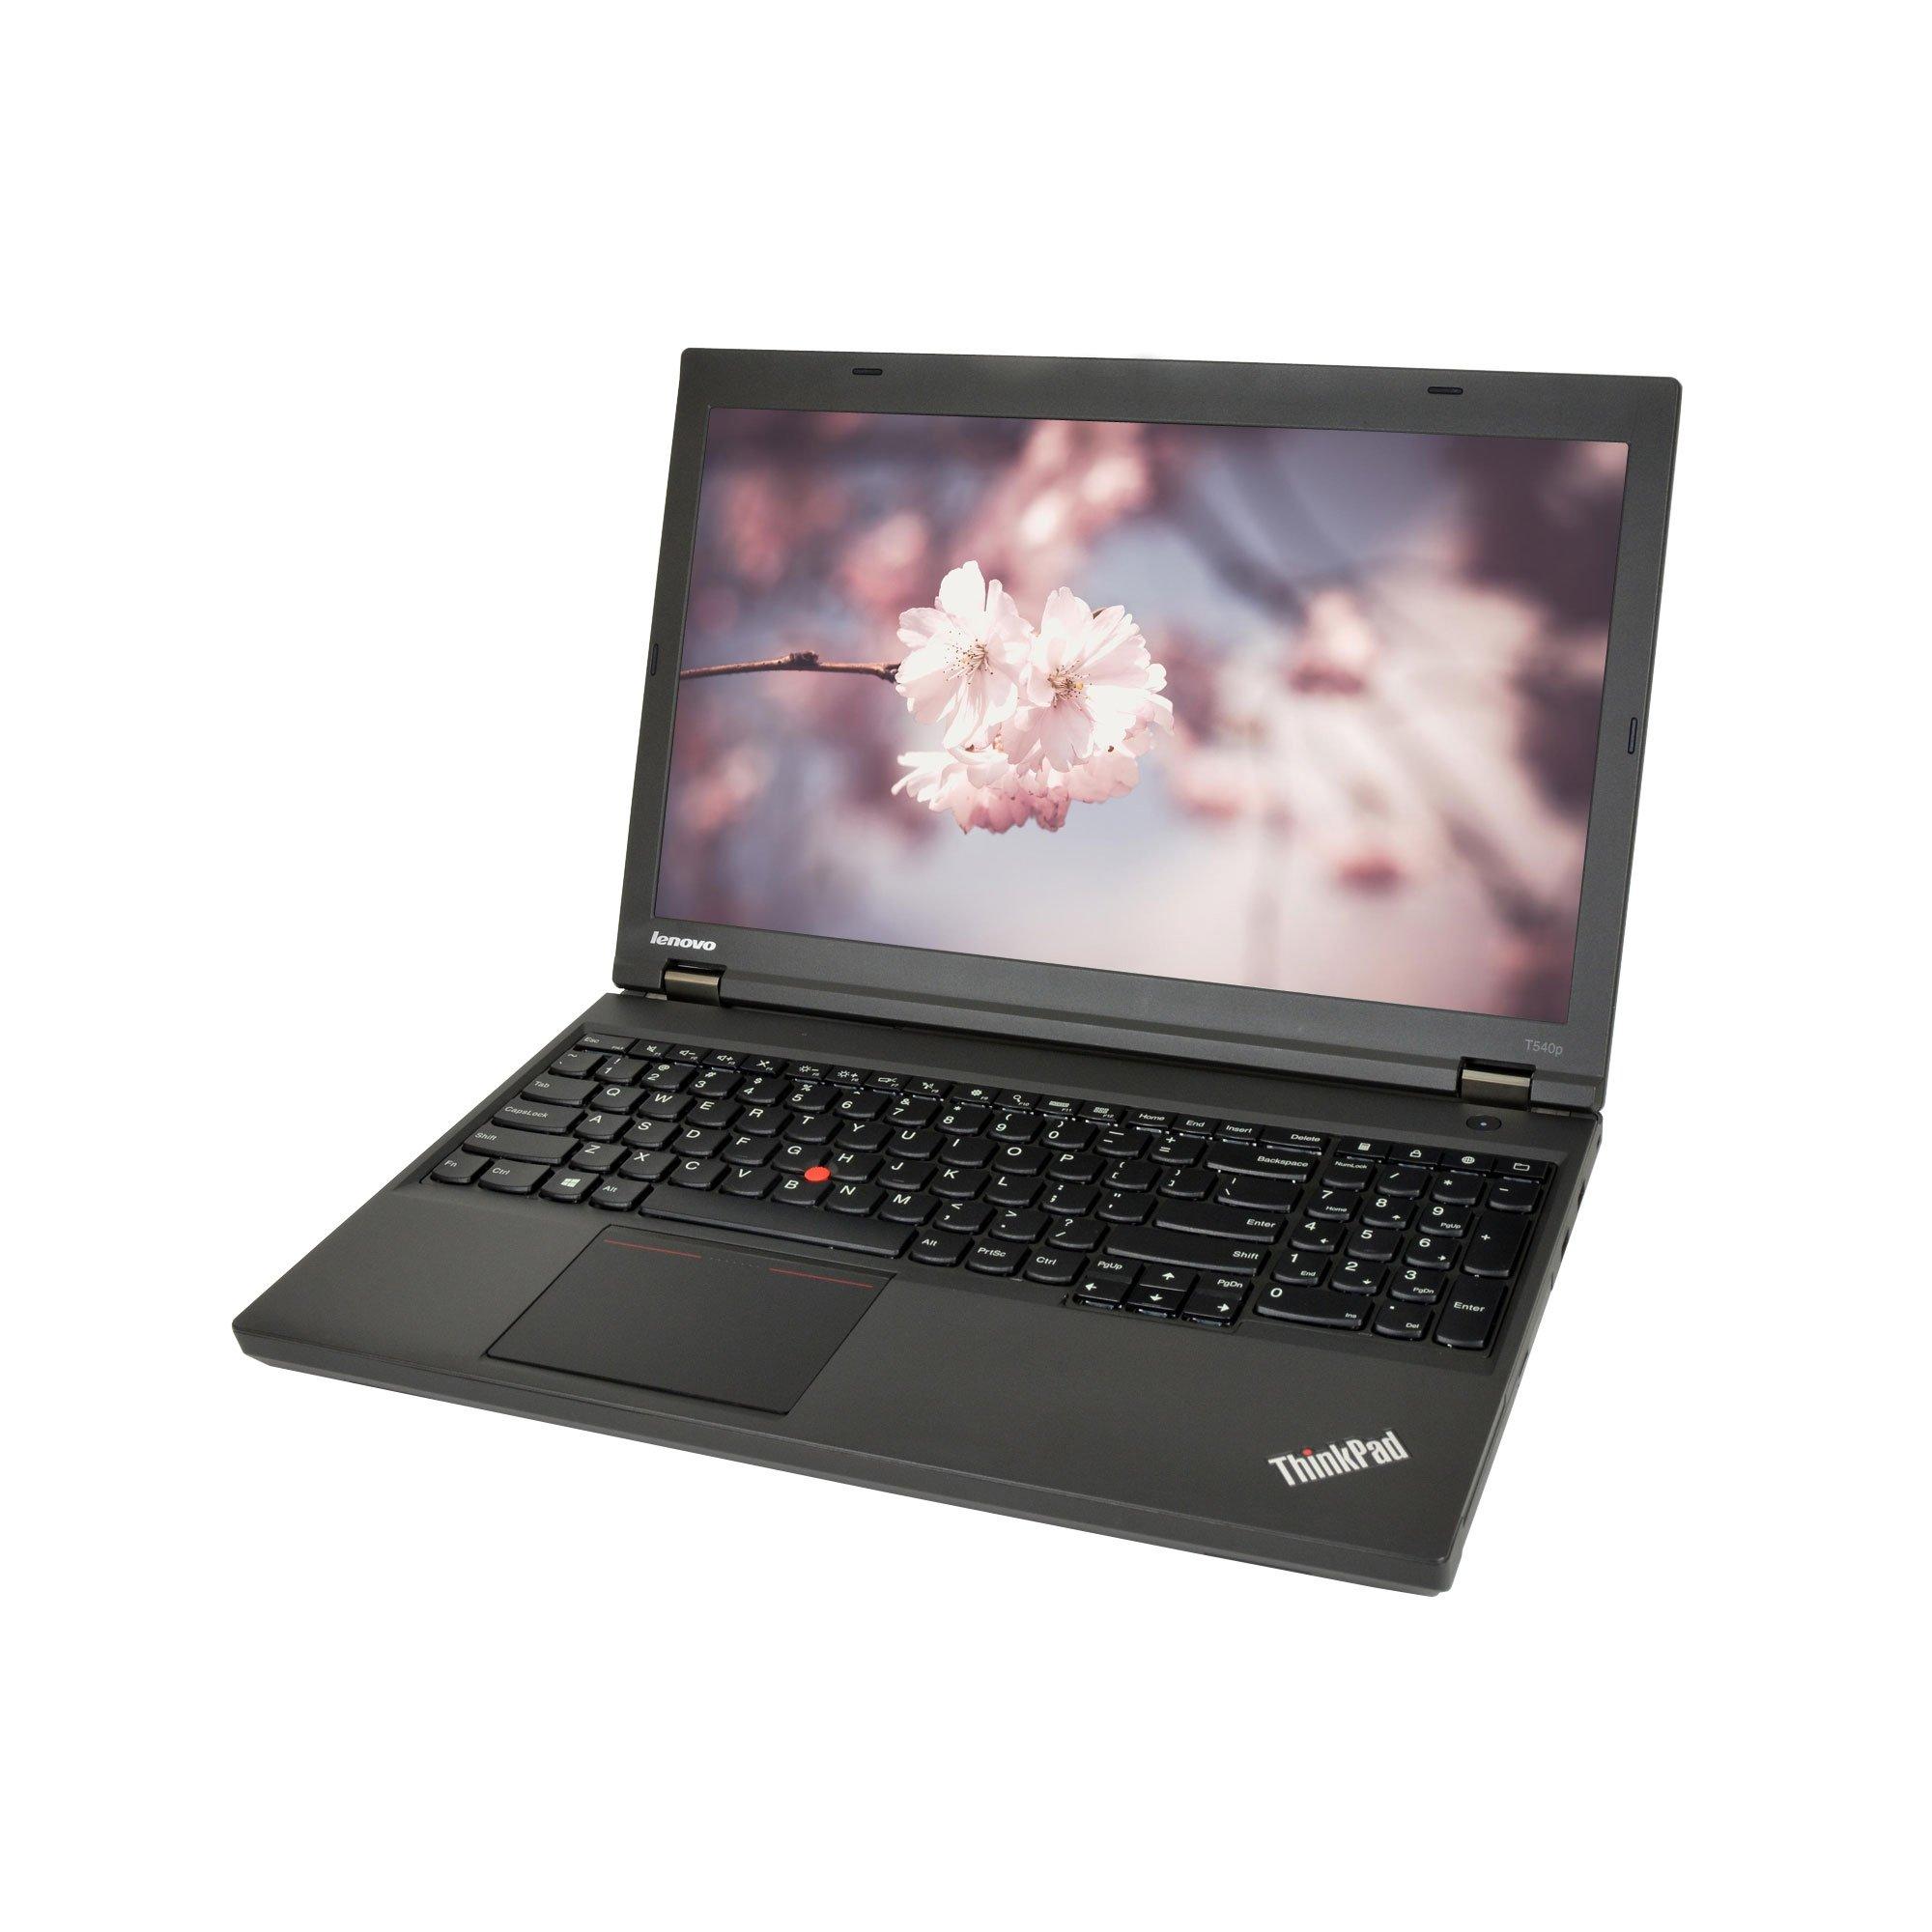 Lenovo ThinkPad T540P Core i7-4700MQ 2.4GHz 16GB RAM 500GB SSD DVD-RW Win 10 Pro 15.6″